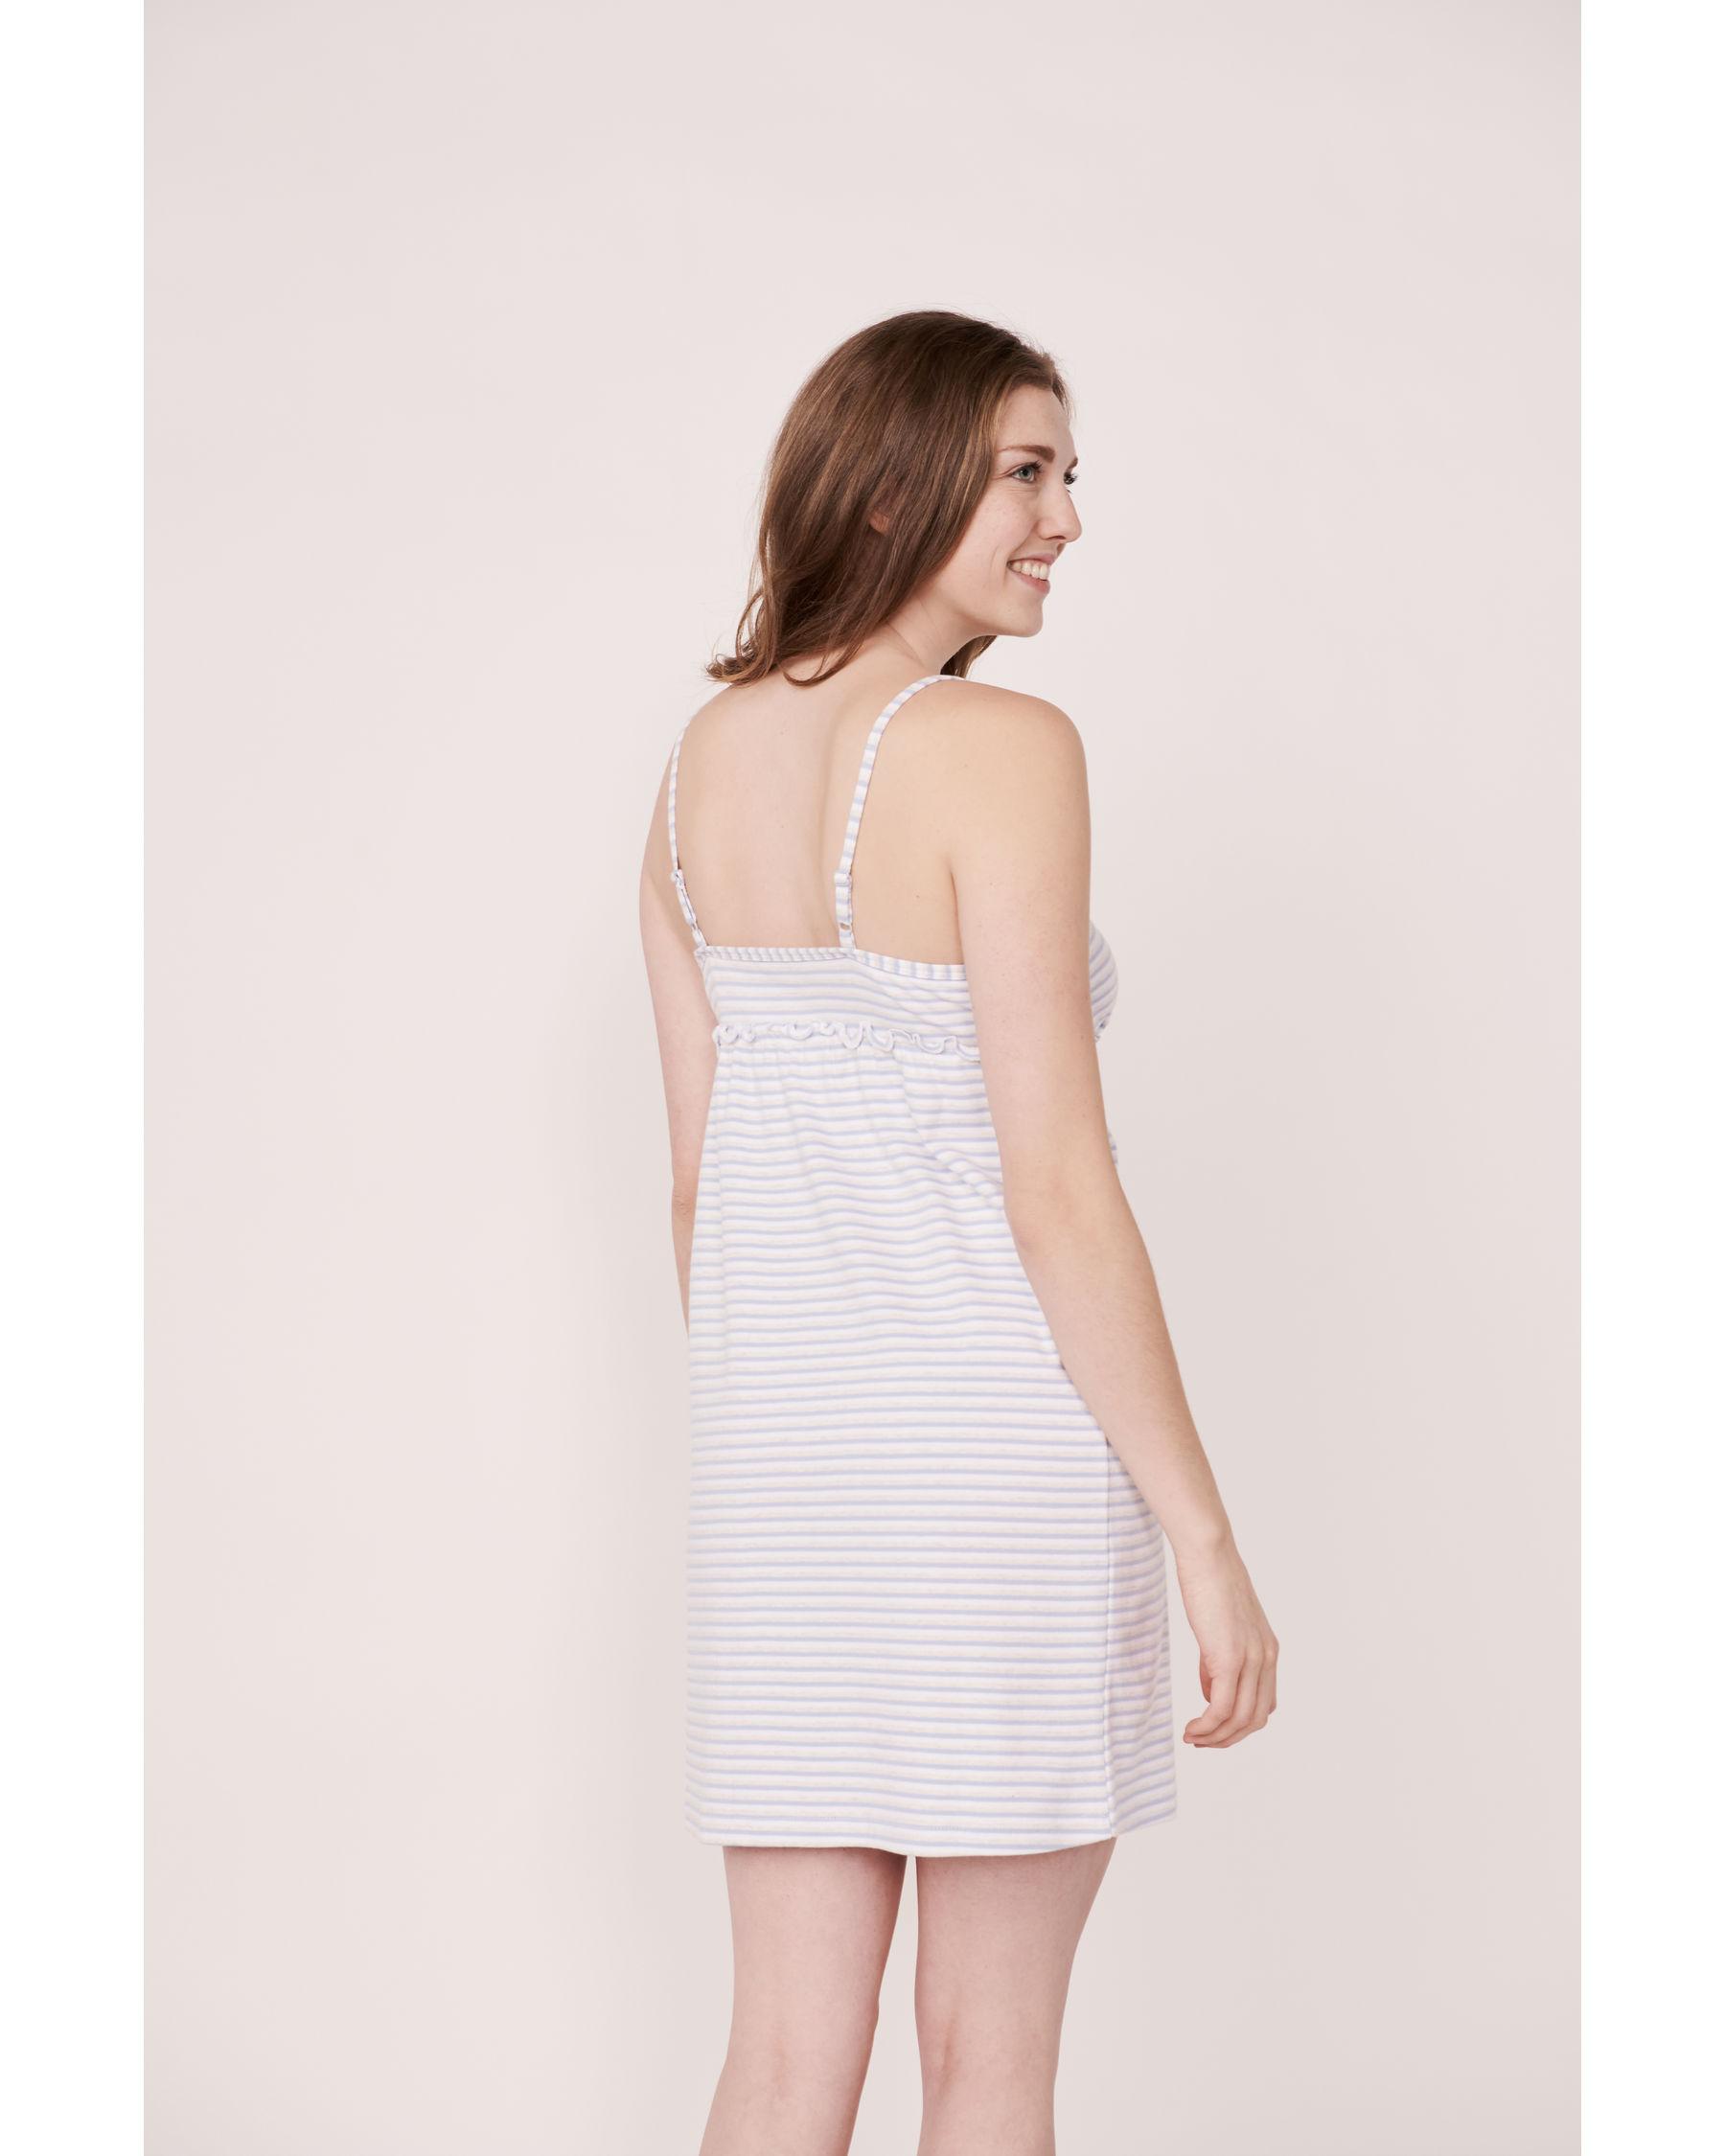 LA VIE EN ROSE Organic Cotton Thin Straps Nightie Blue and white stripes 40500003 - View2